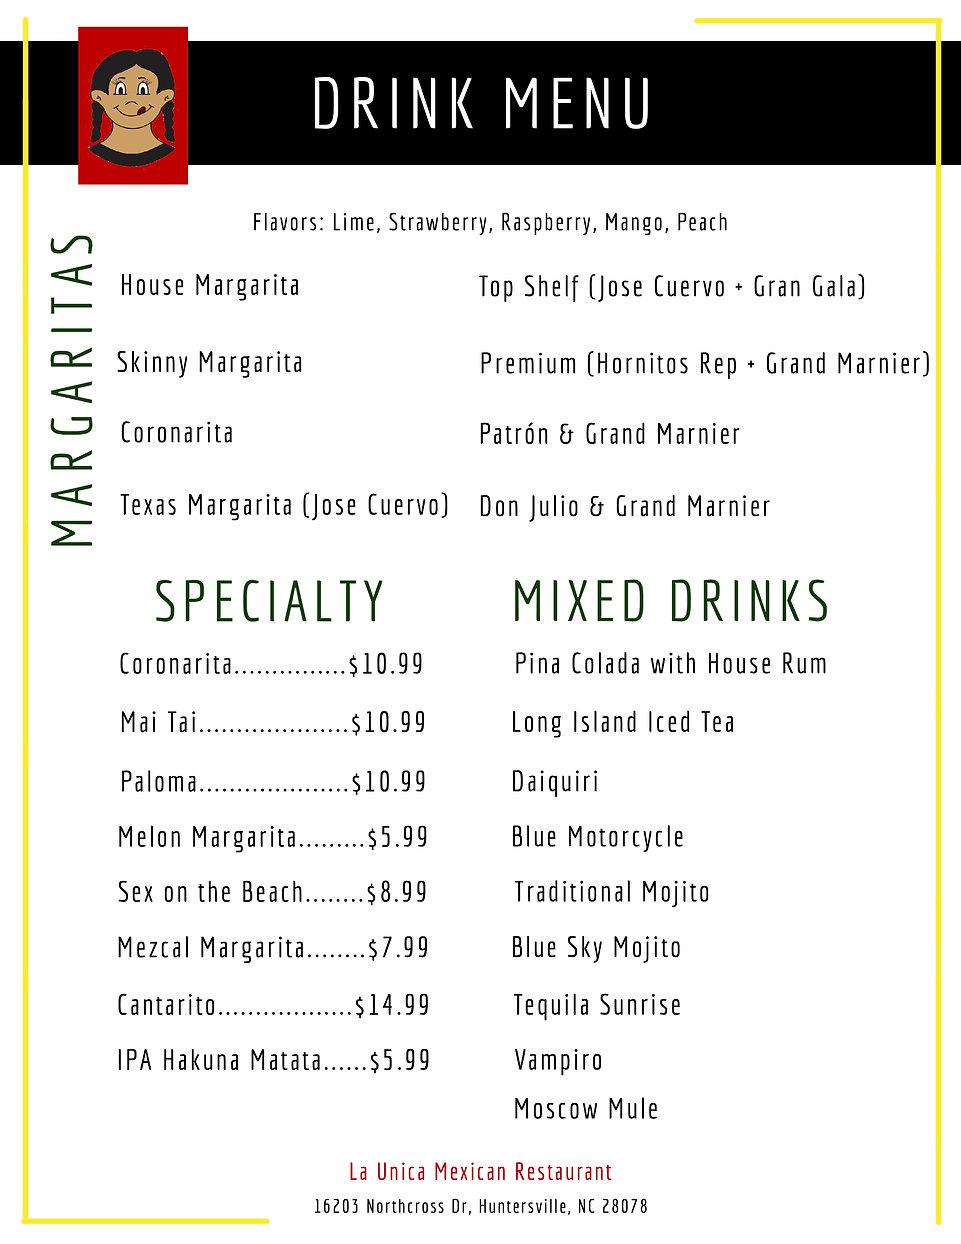 La Unica Drink Menu-2.jpg